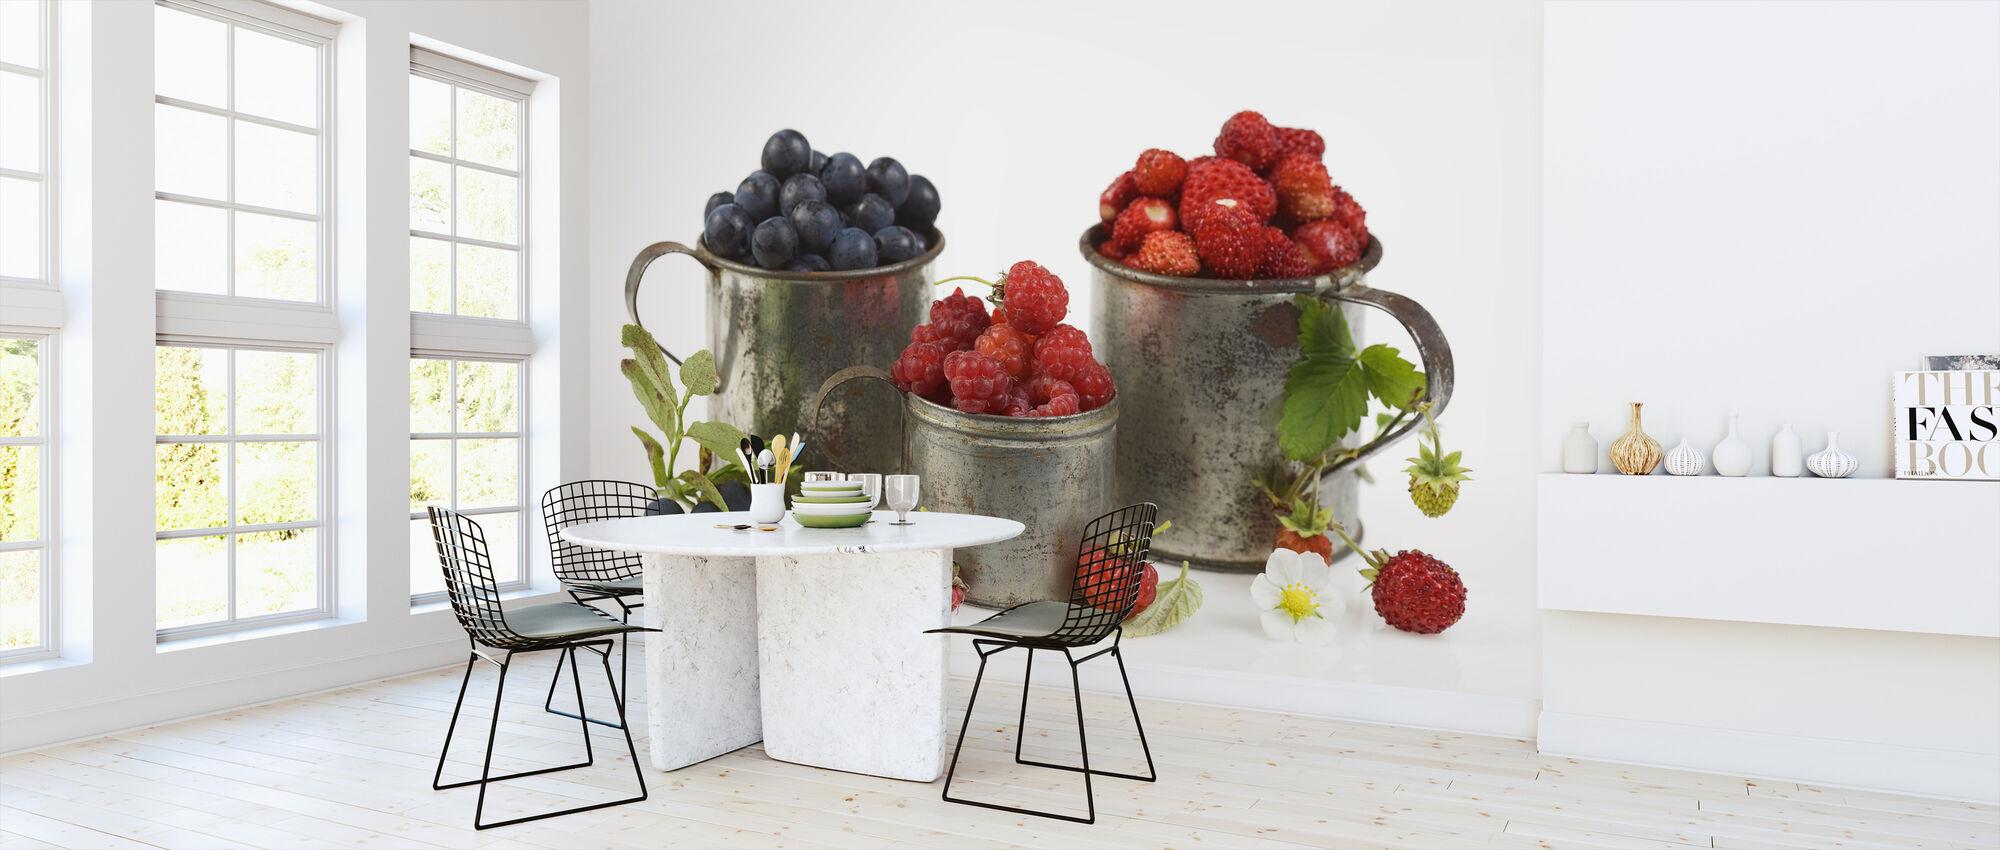 Blueberries Rasberries and Strawberries - Wallpaper - Kitchen